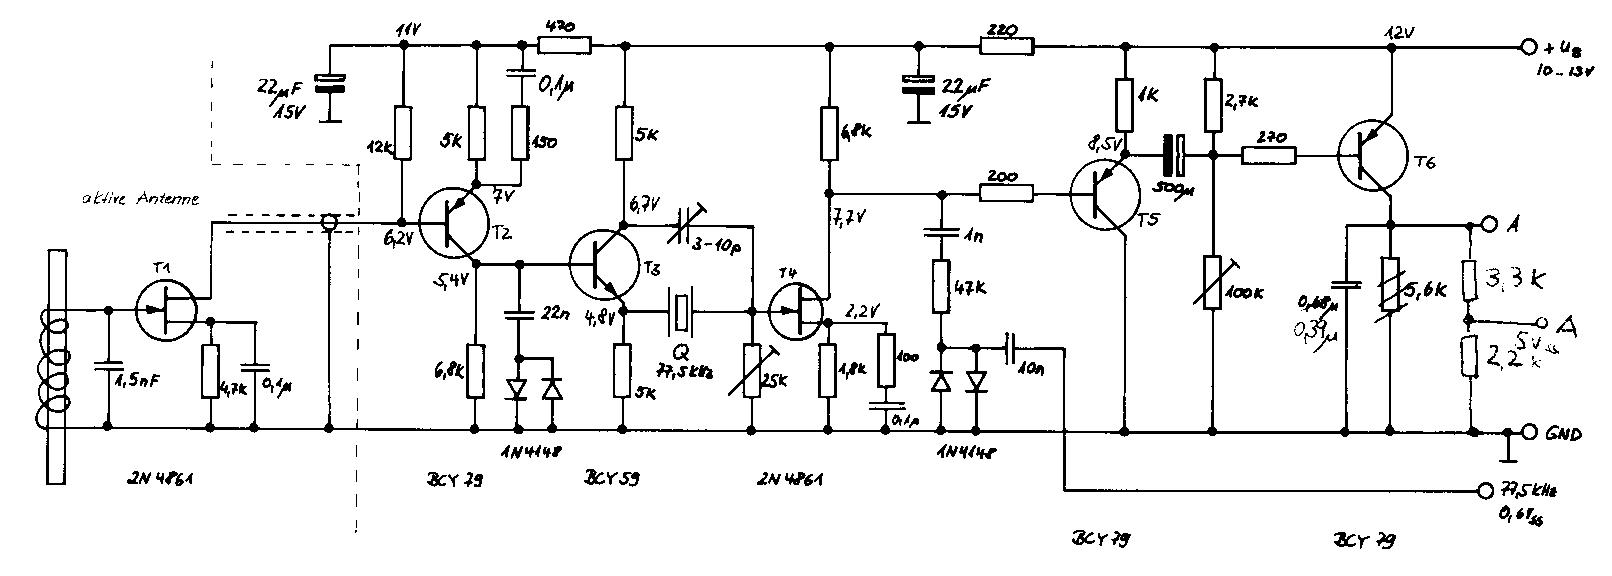 quarzfilter dcf77